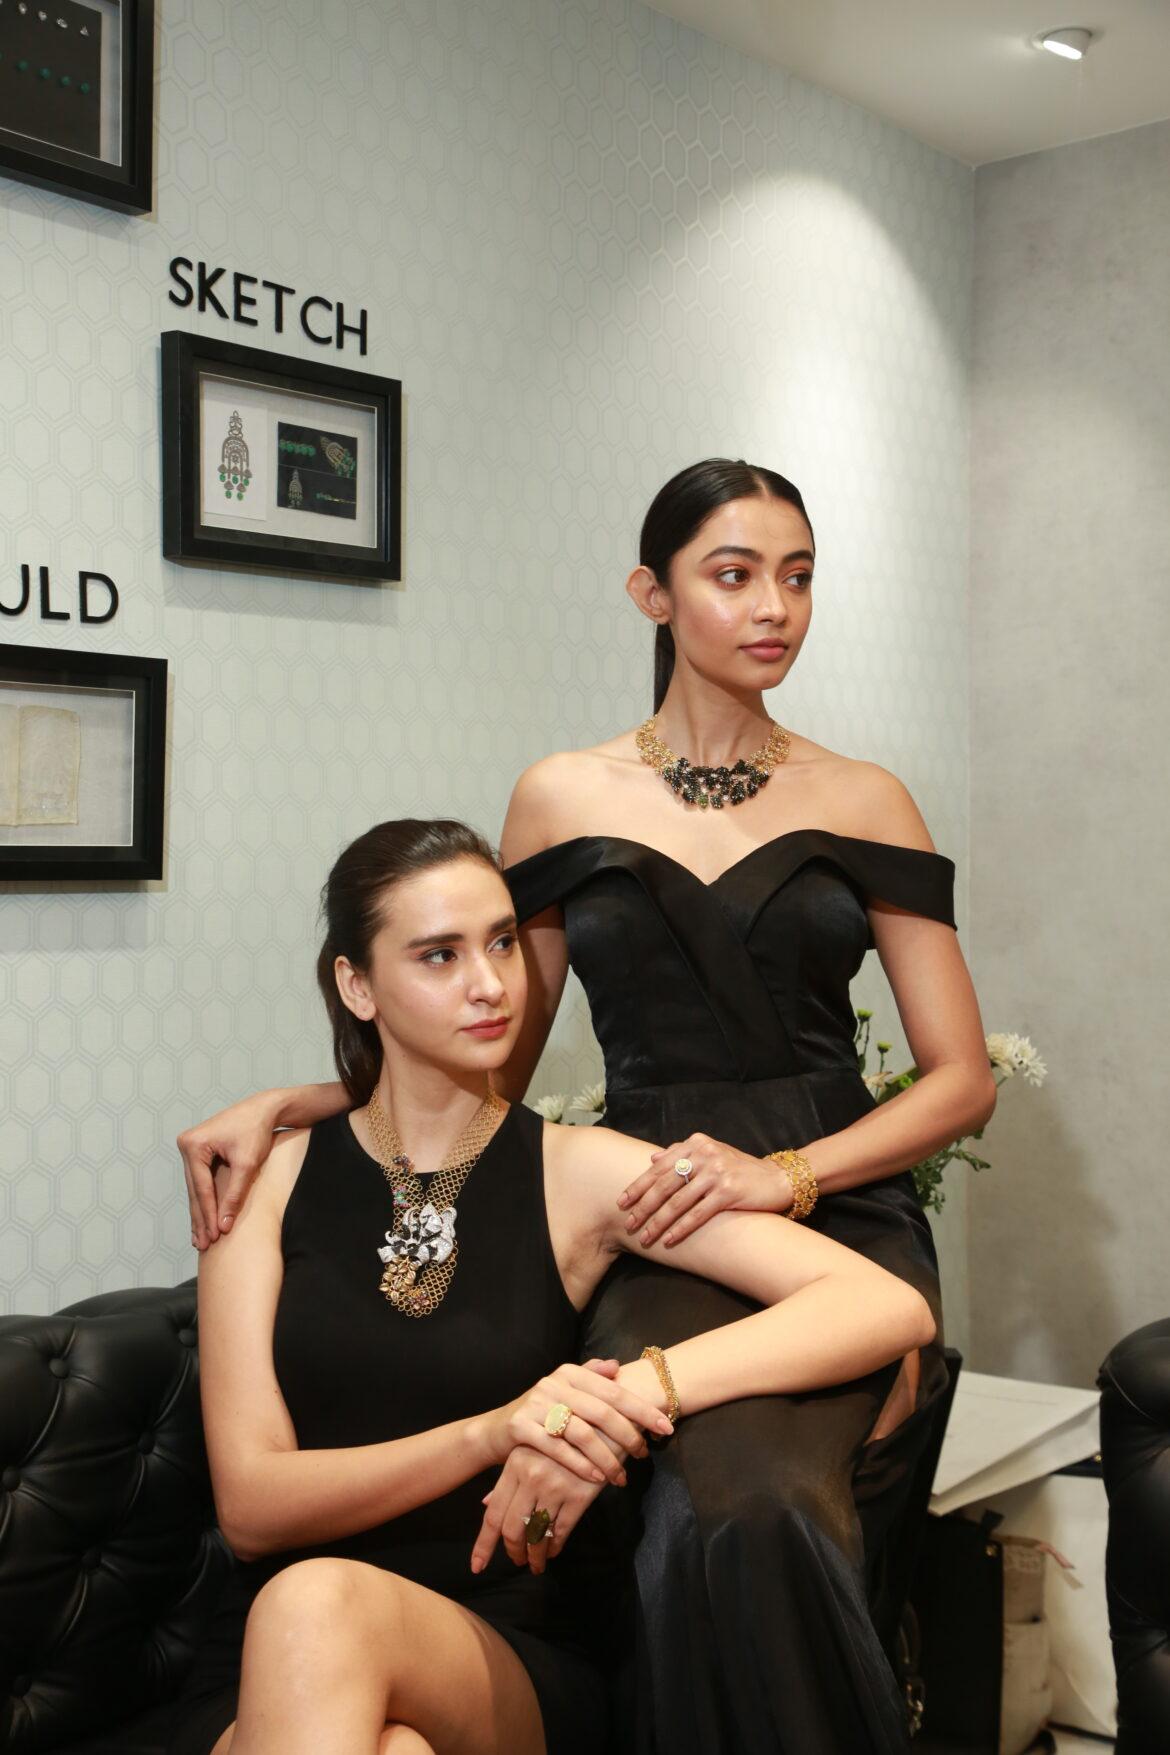 Bespoke Fine Jewelry brand Nornament launches their new showroom in Kolkata